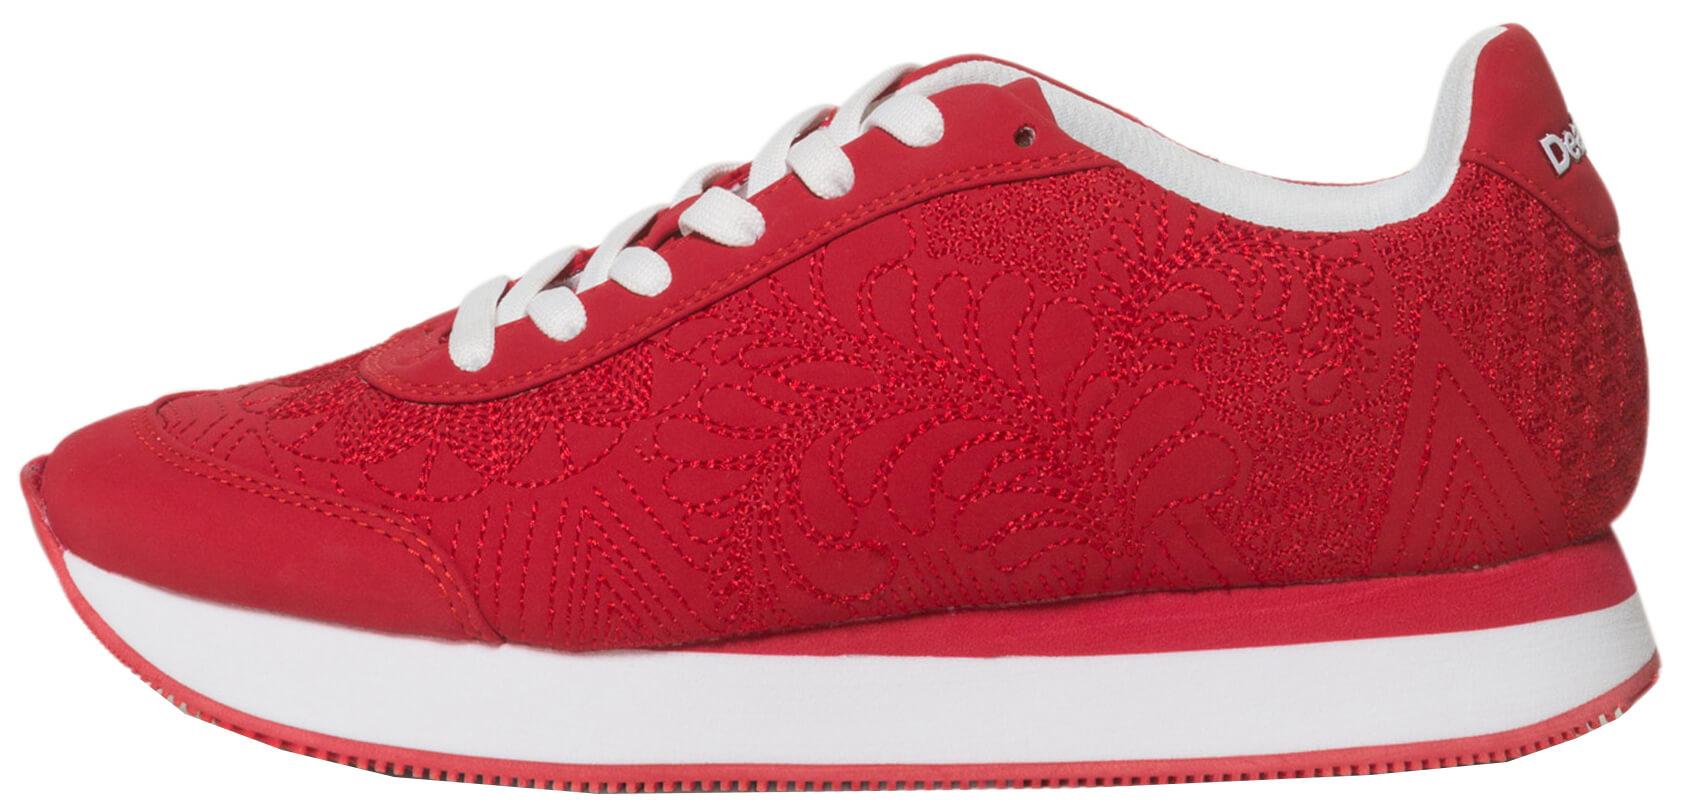 Desigual Női cipő Gala xy Lottie Piros kínai Olvasni 19SSKP02 3144 ... ee3f968602